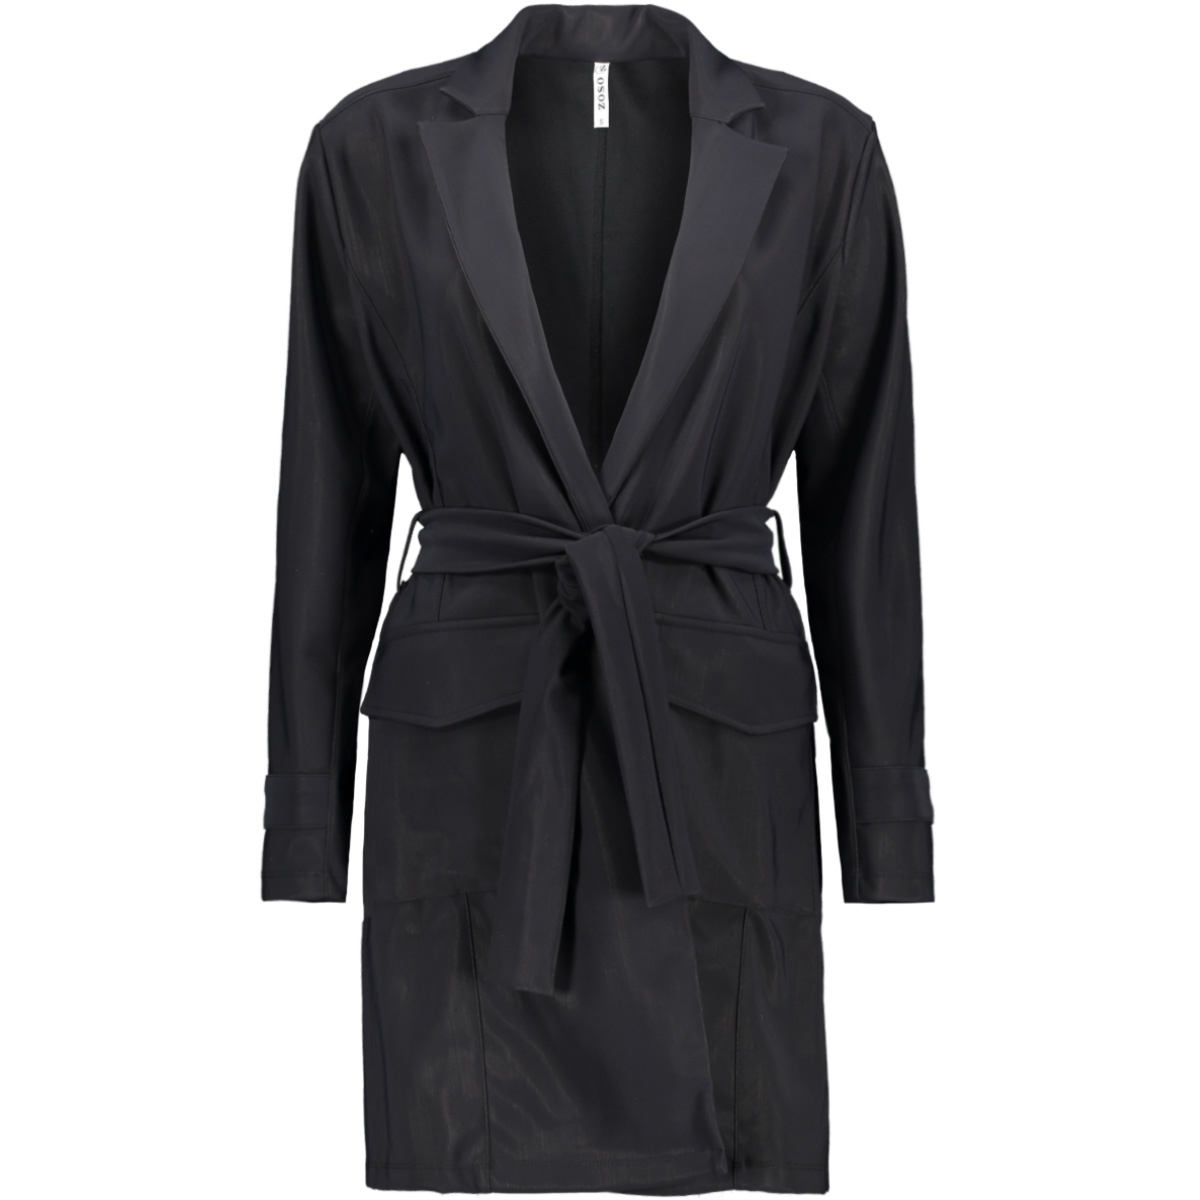 hoxton travel coat 194 zoso blazer black